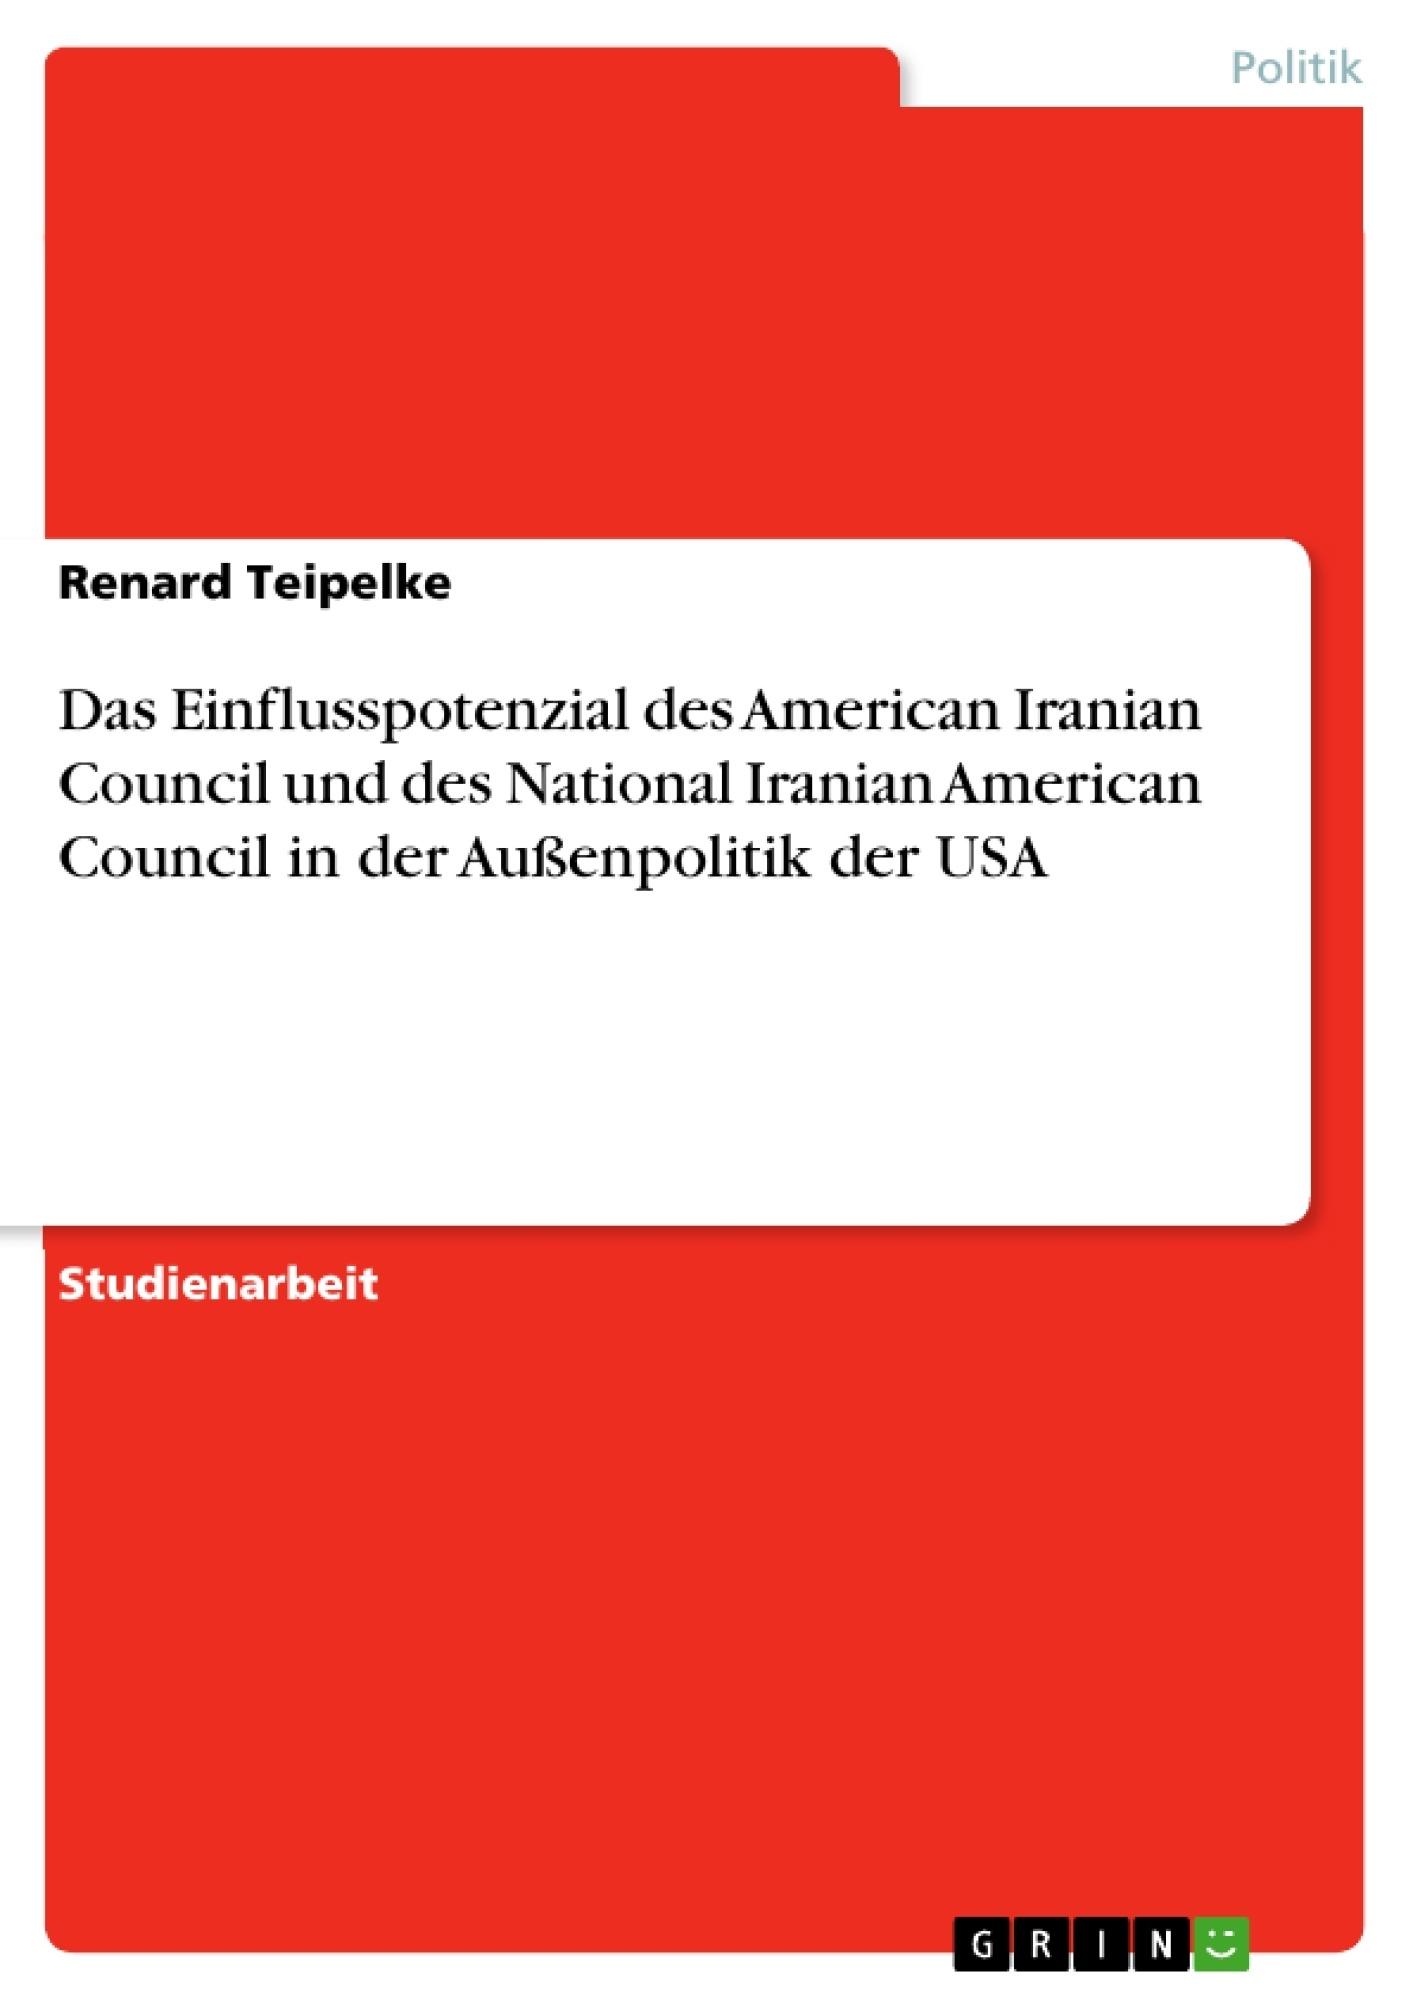 Titel: Das Einflusspotenzial des American Iranian Council und des National Iranian American Council in der Außenpolitik der USA